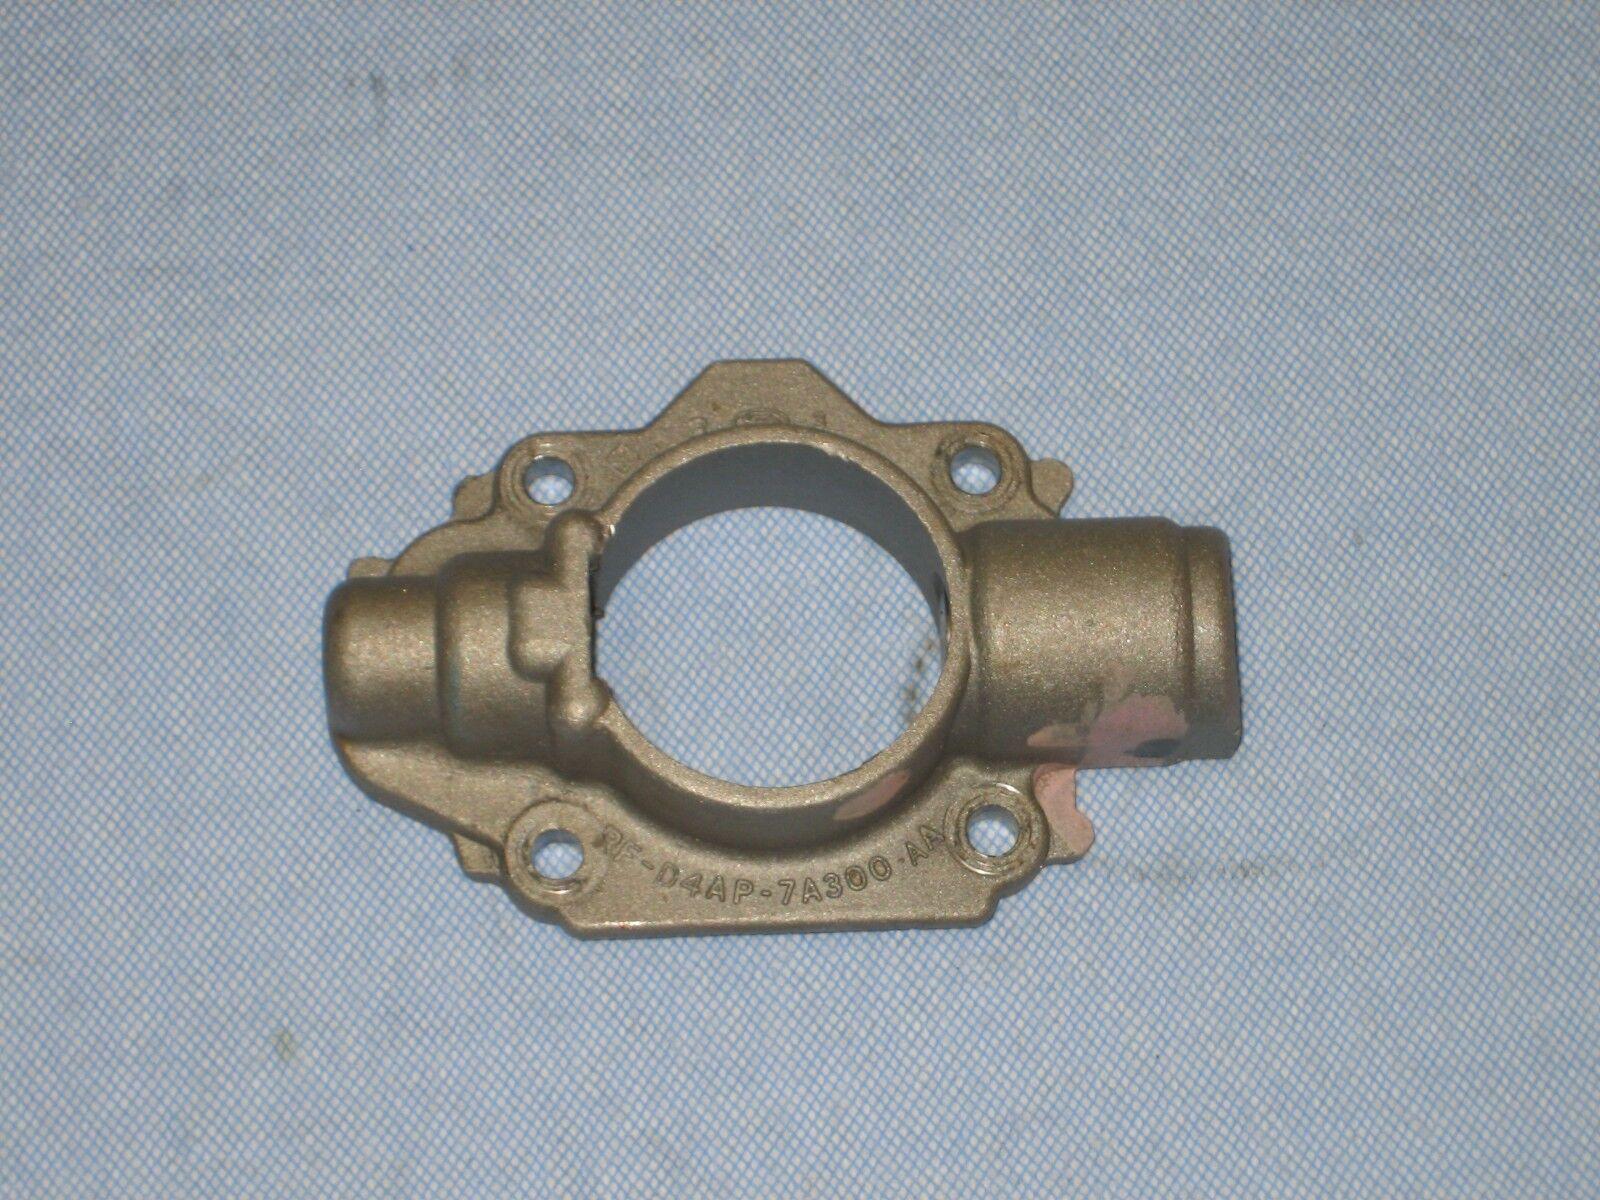 New OEM Fuel Injector for Ford F150 2009 2010 4.6L FJ995